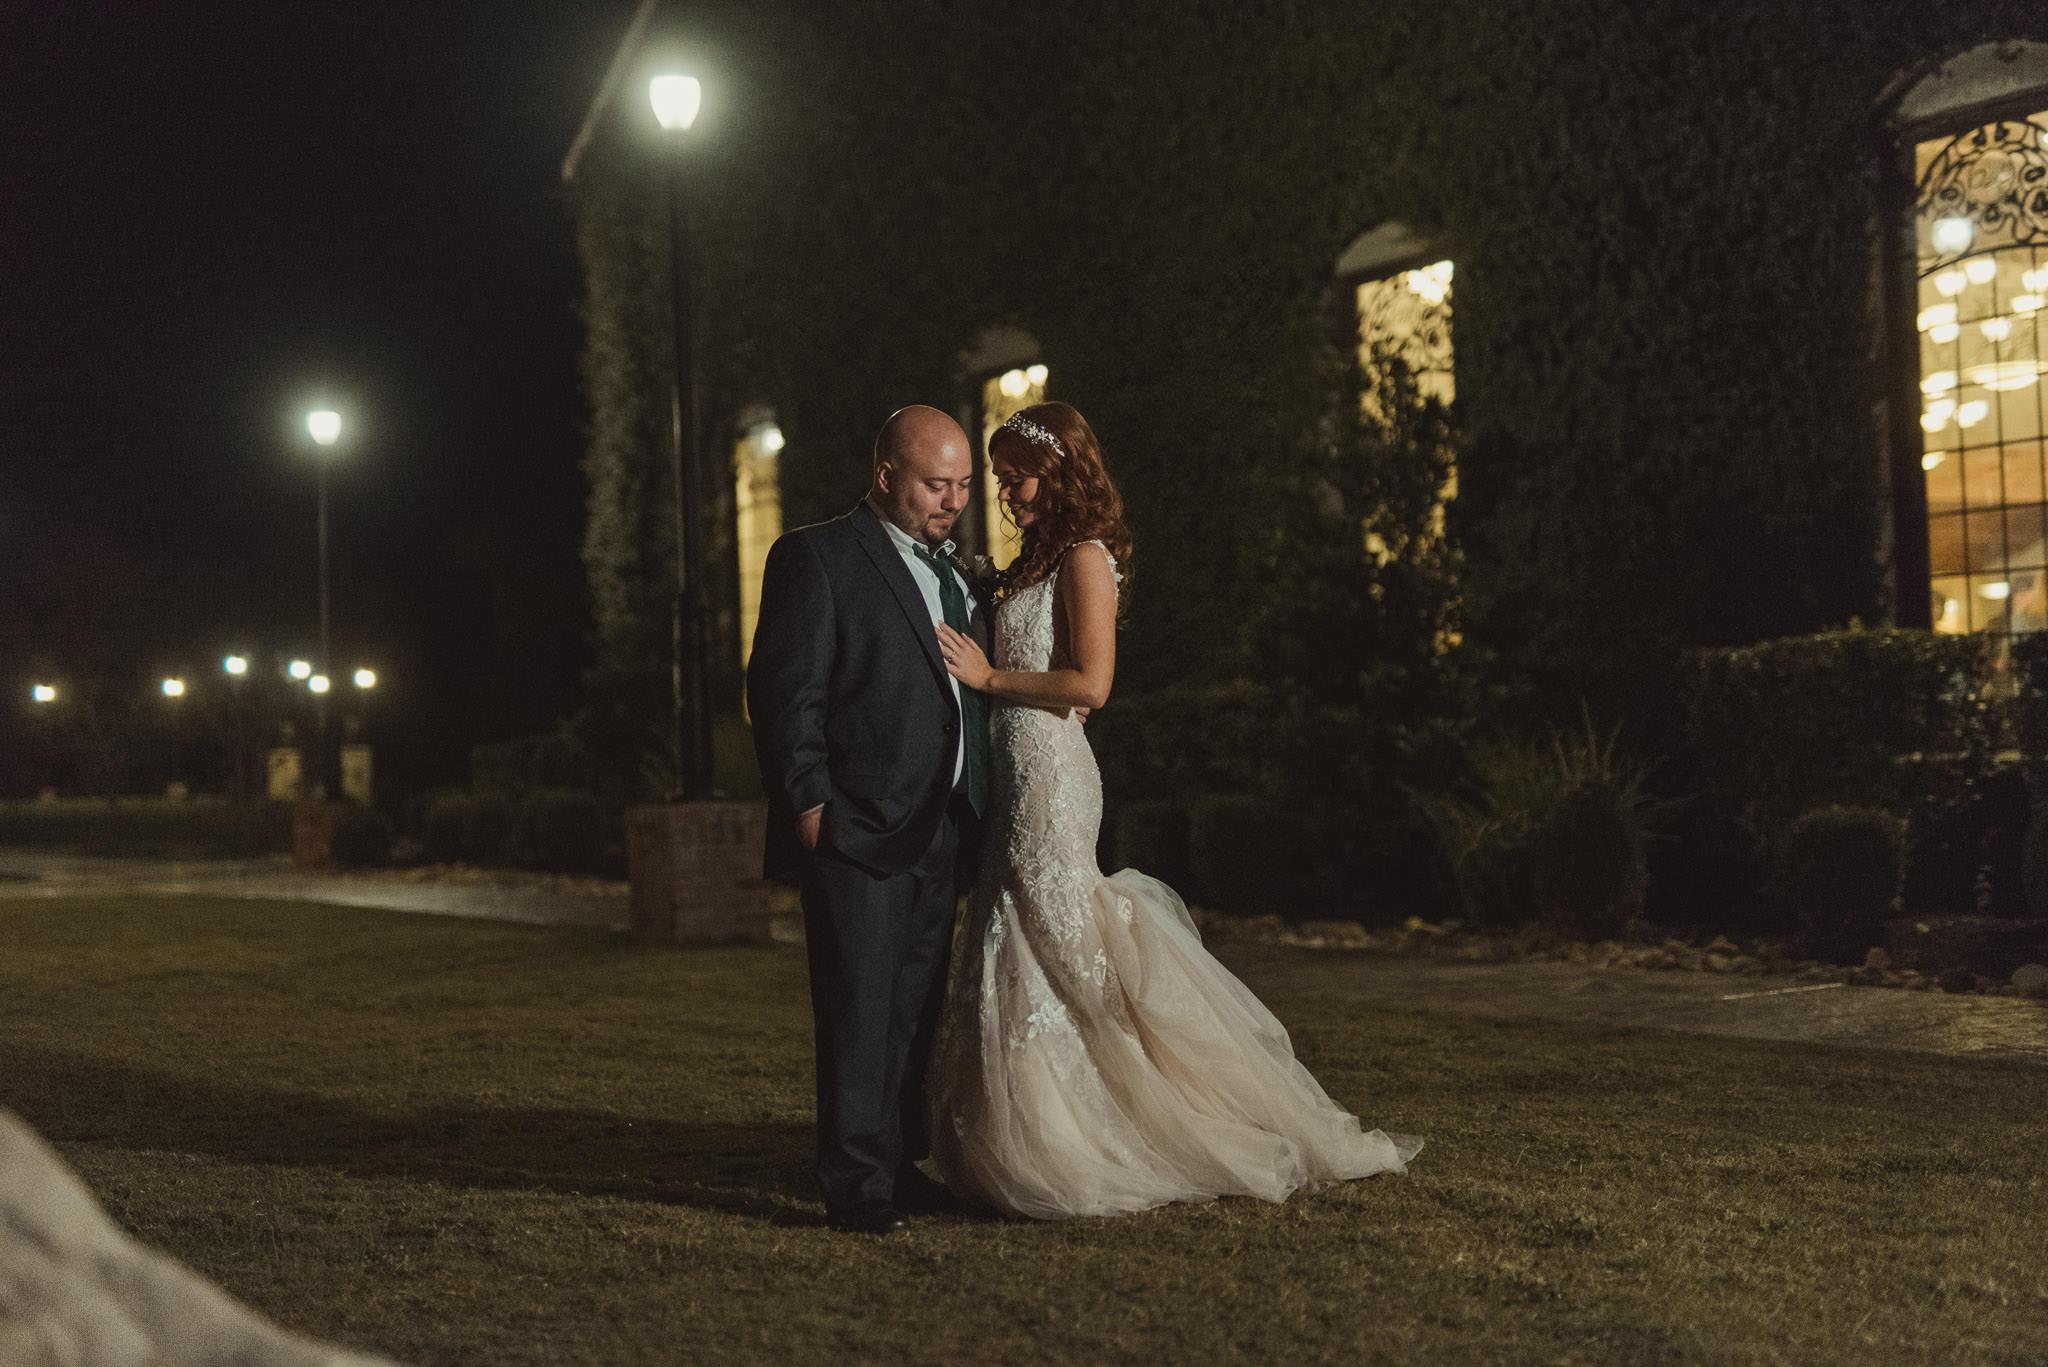 Cynthia-Curtis-Olde-Dobbine-Station-Houston-Wedding-Photographer-sm-95.jpg